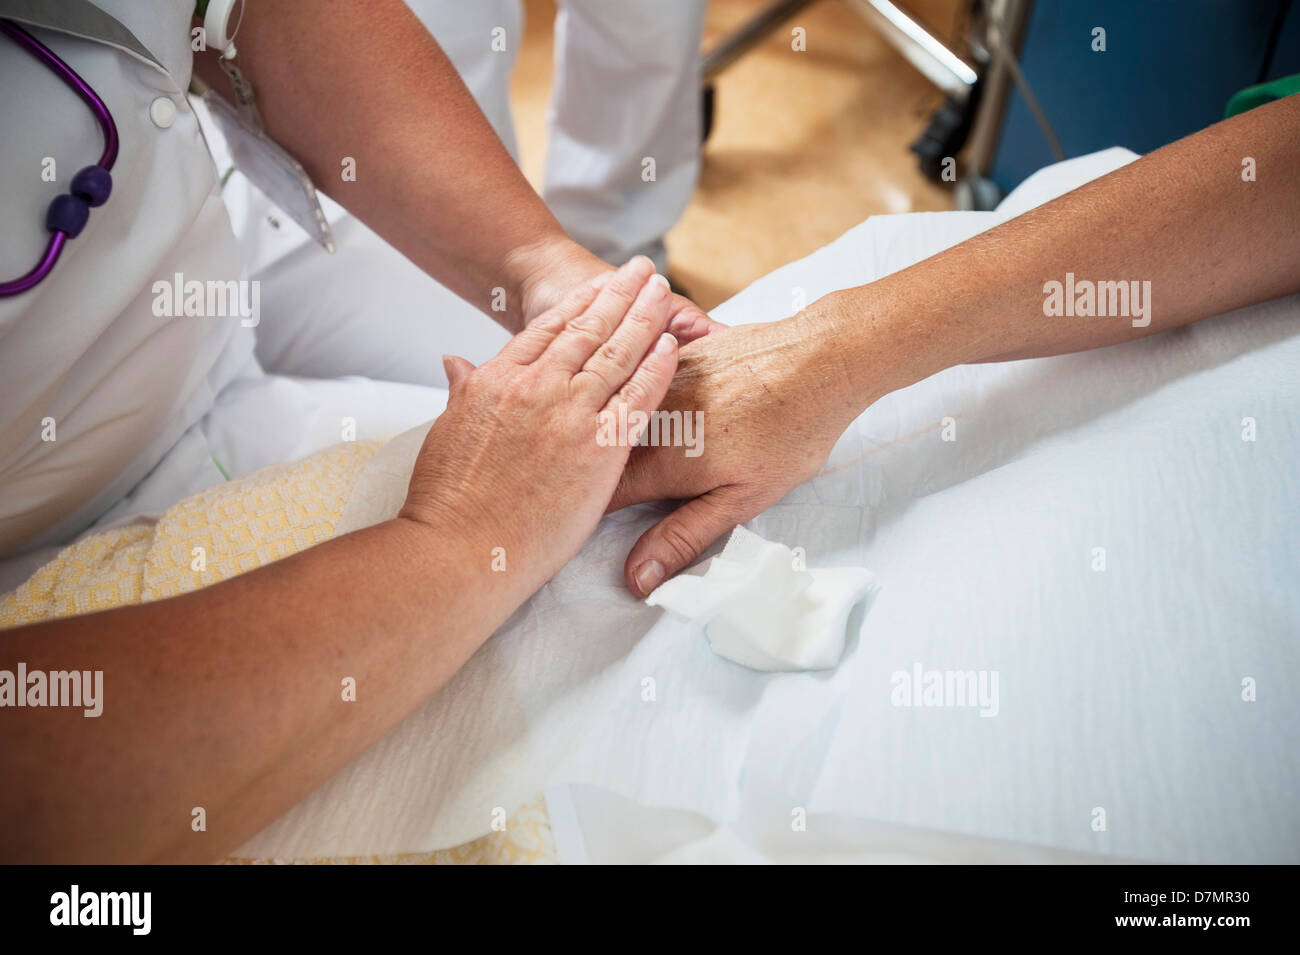 Nurse preparing a patient for an IV line - Stock Image